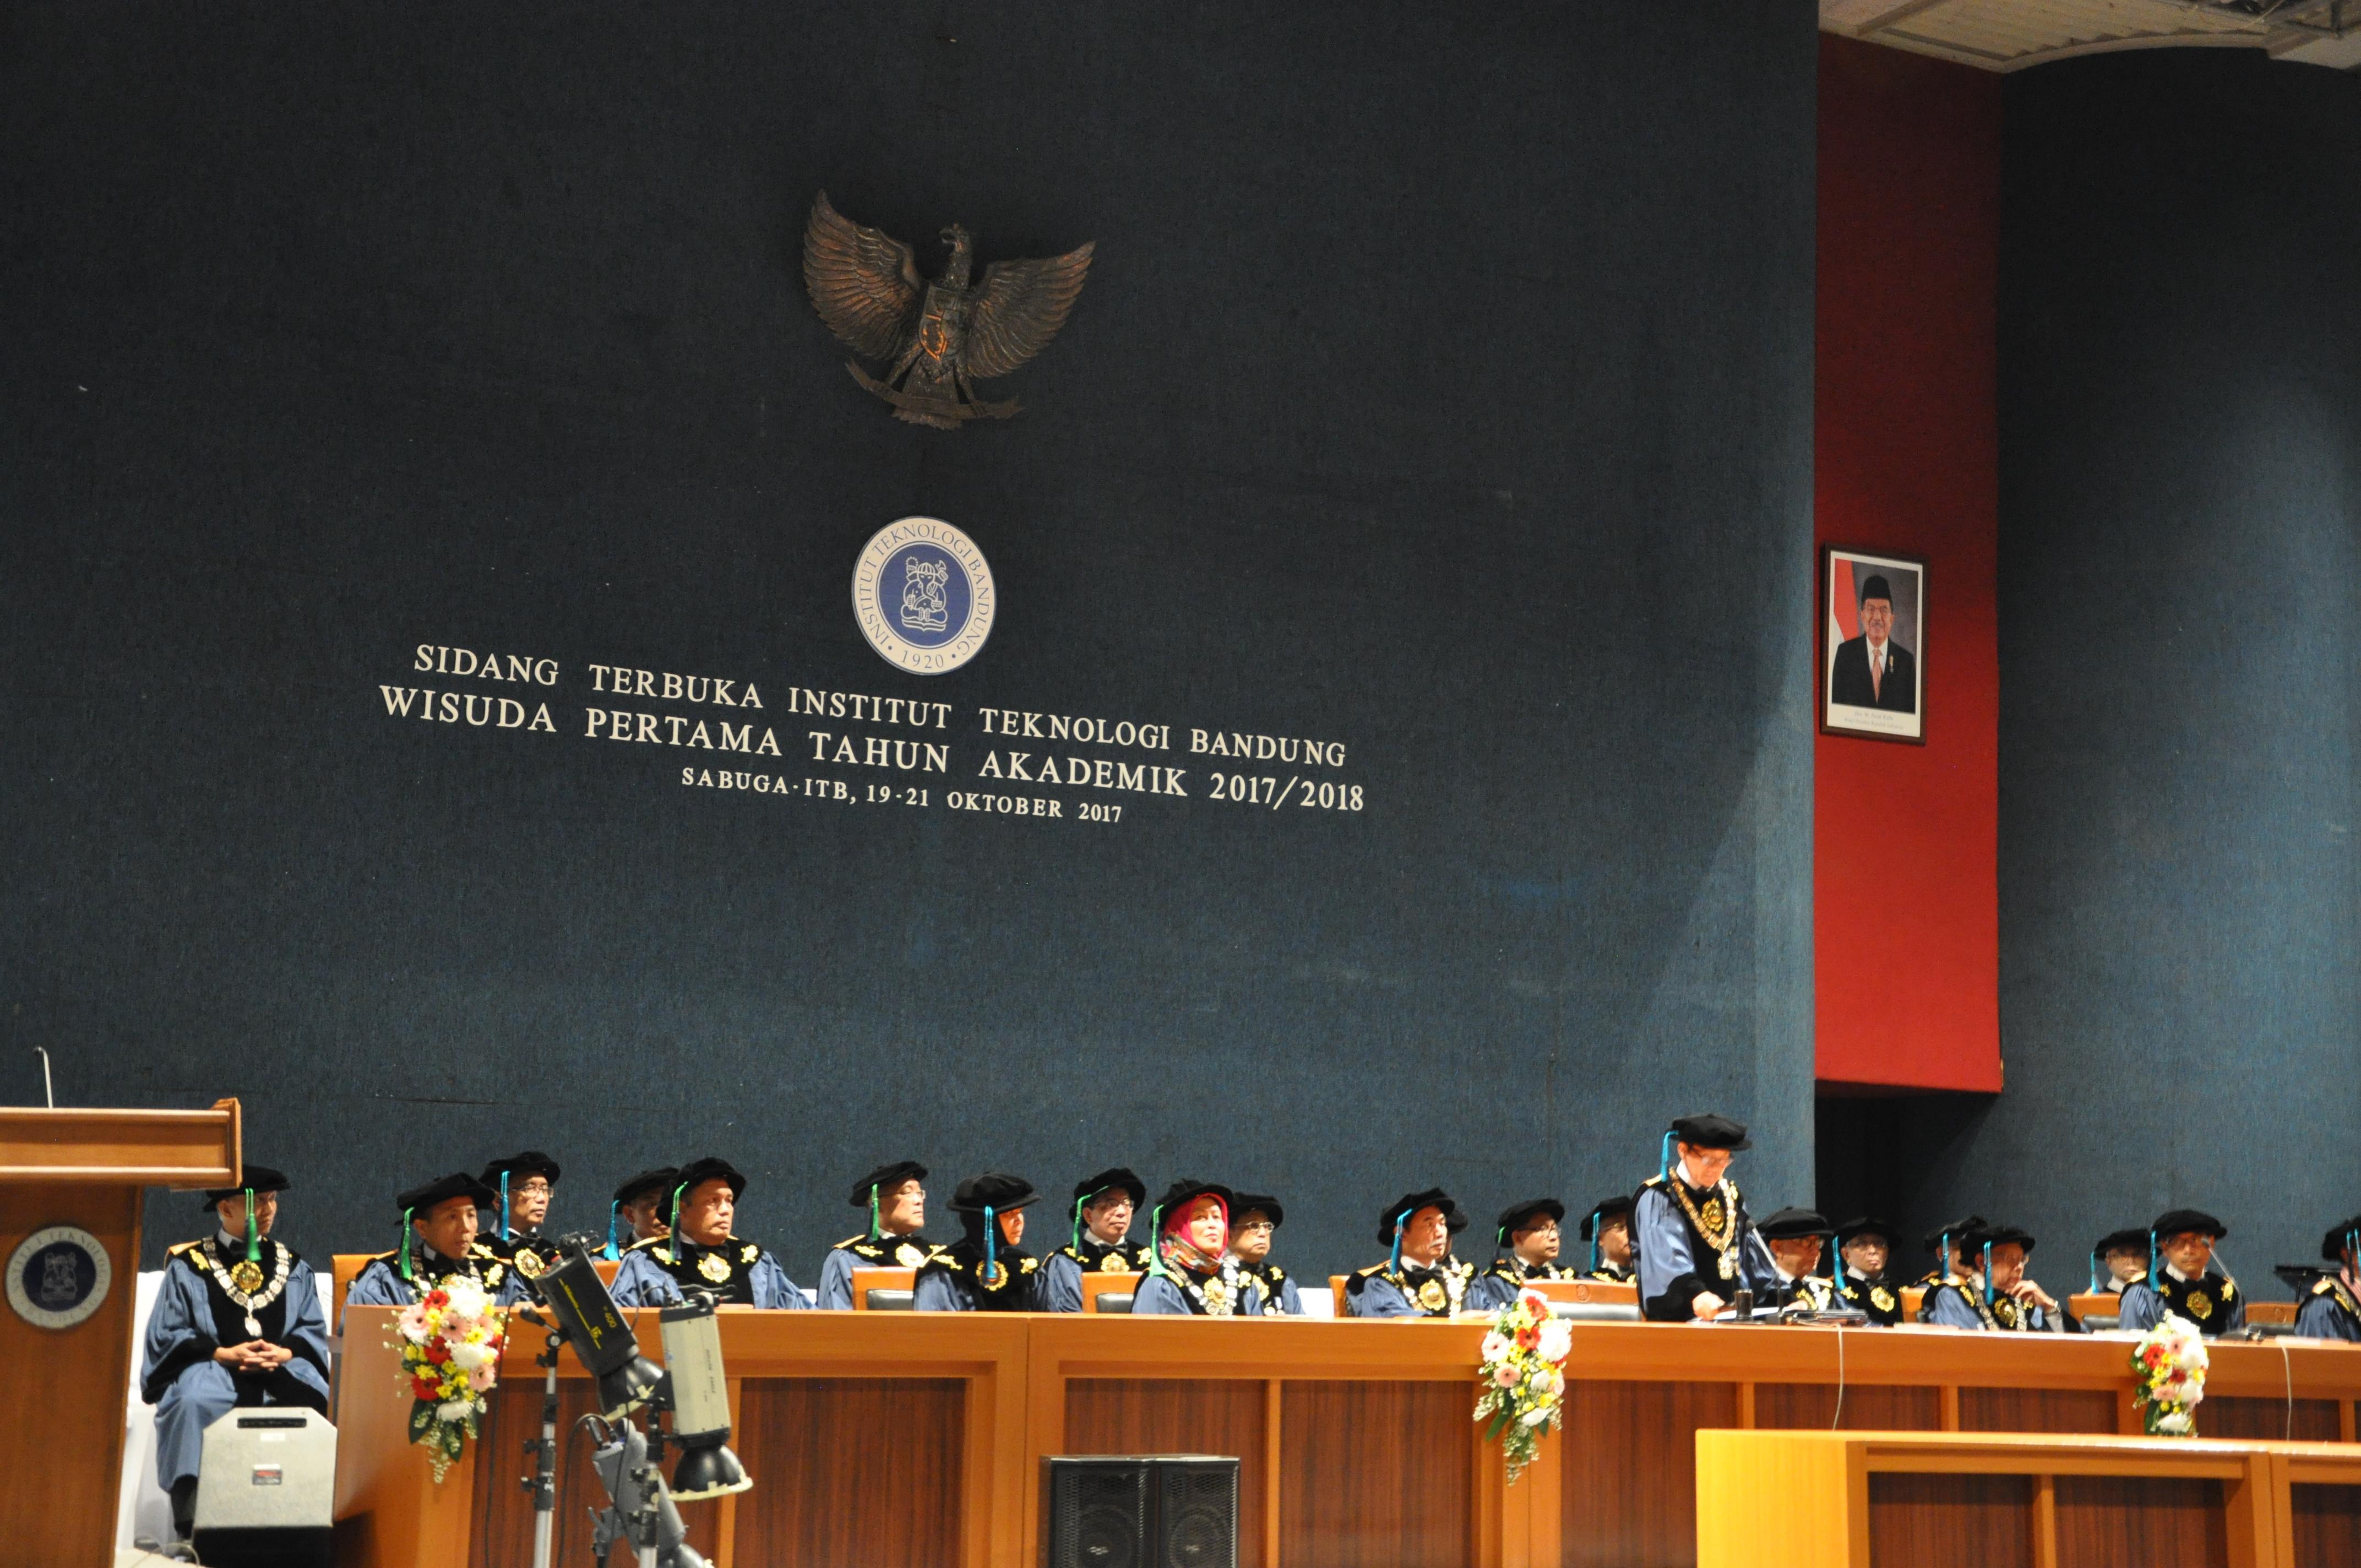 Teknologi Pangan Menjadi Tema Sambutan Rektor di Upacara Wisuda Pertama ITB Tahun Akademik 2017/2018